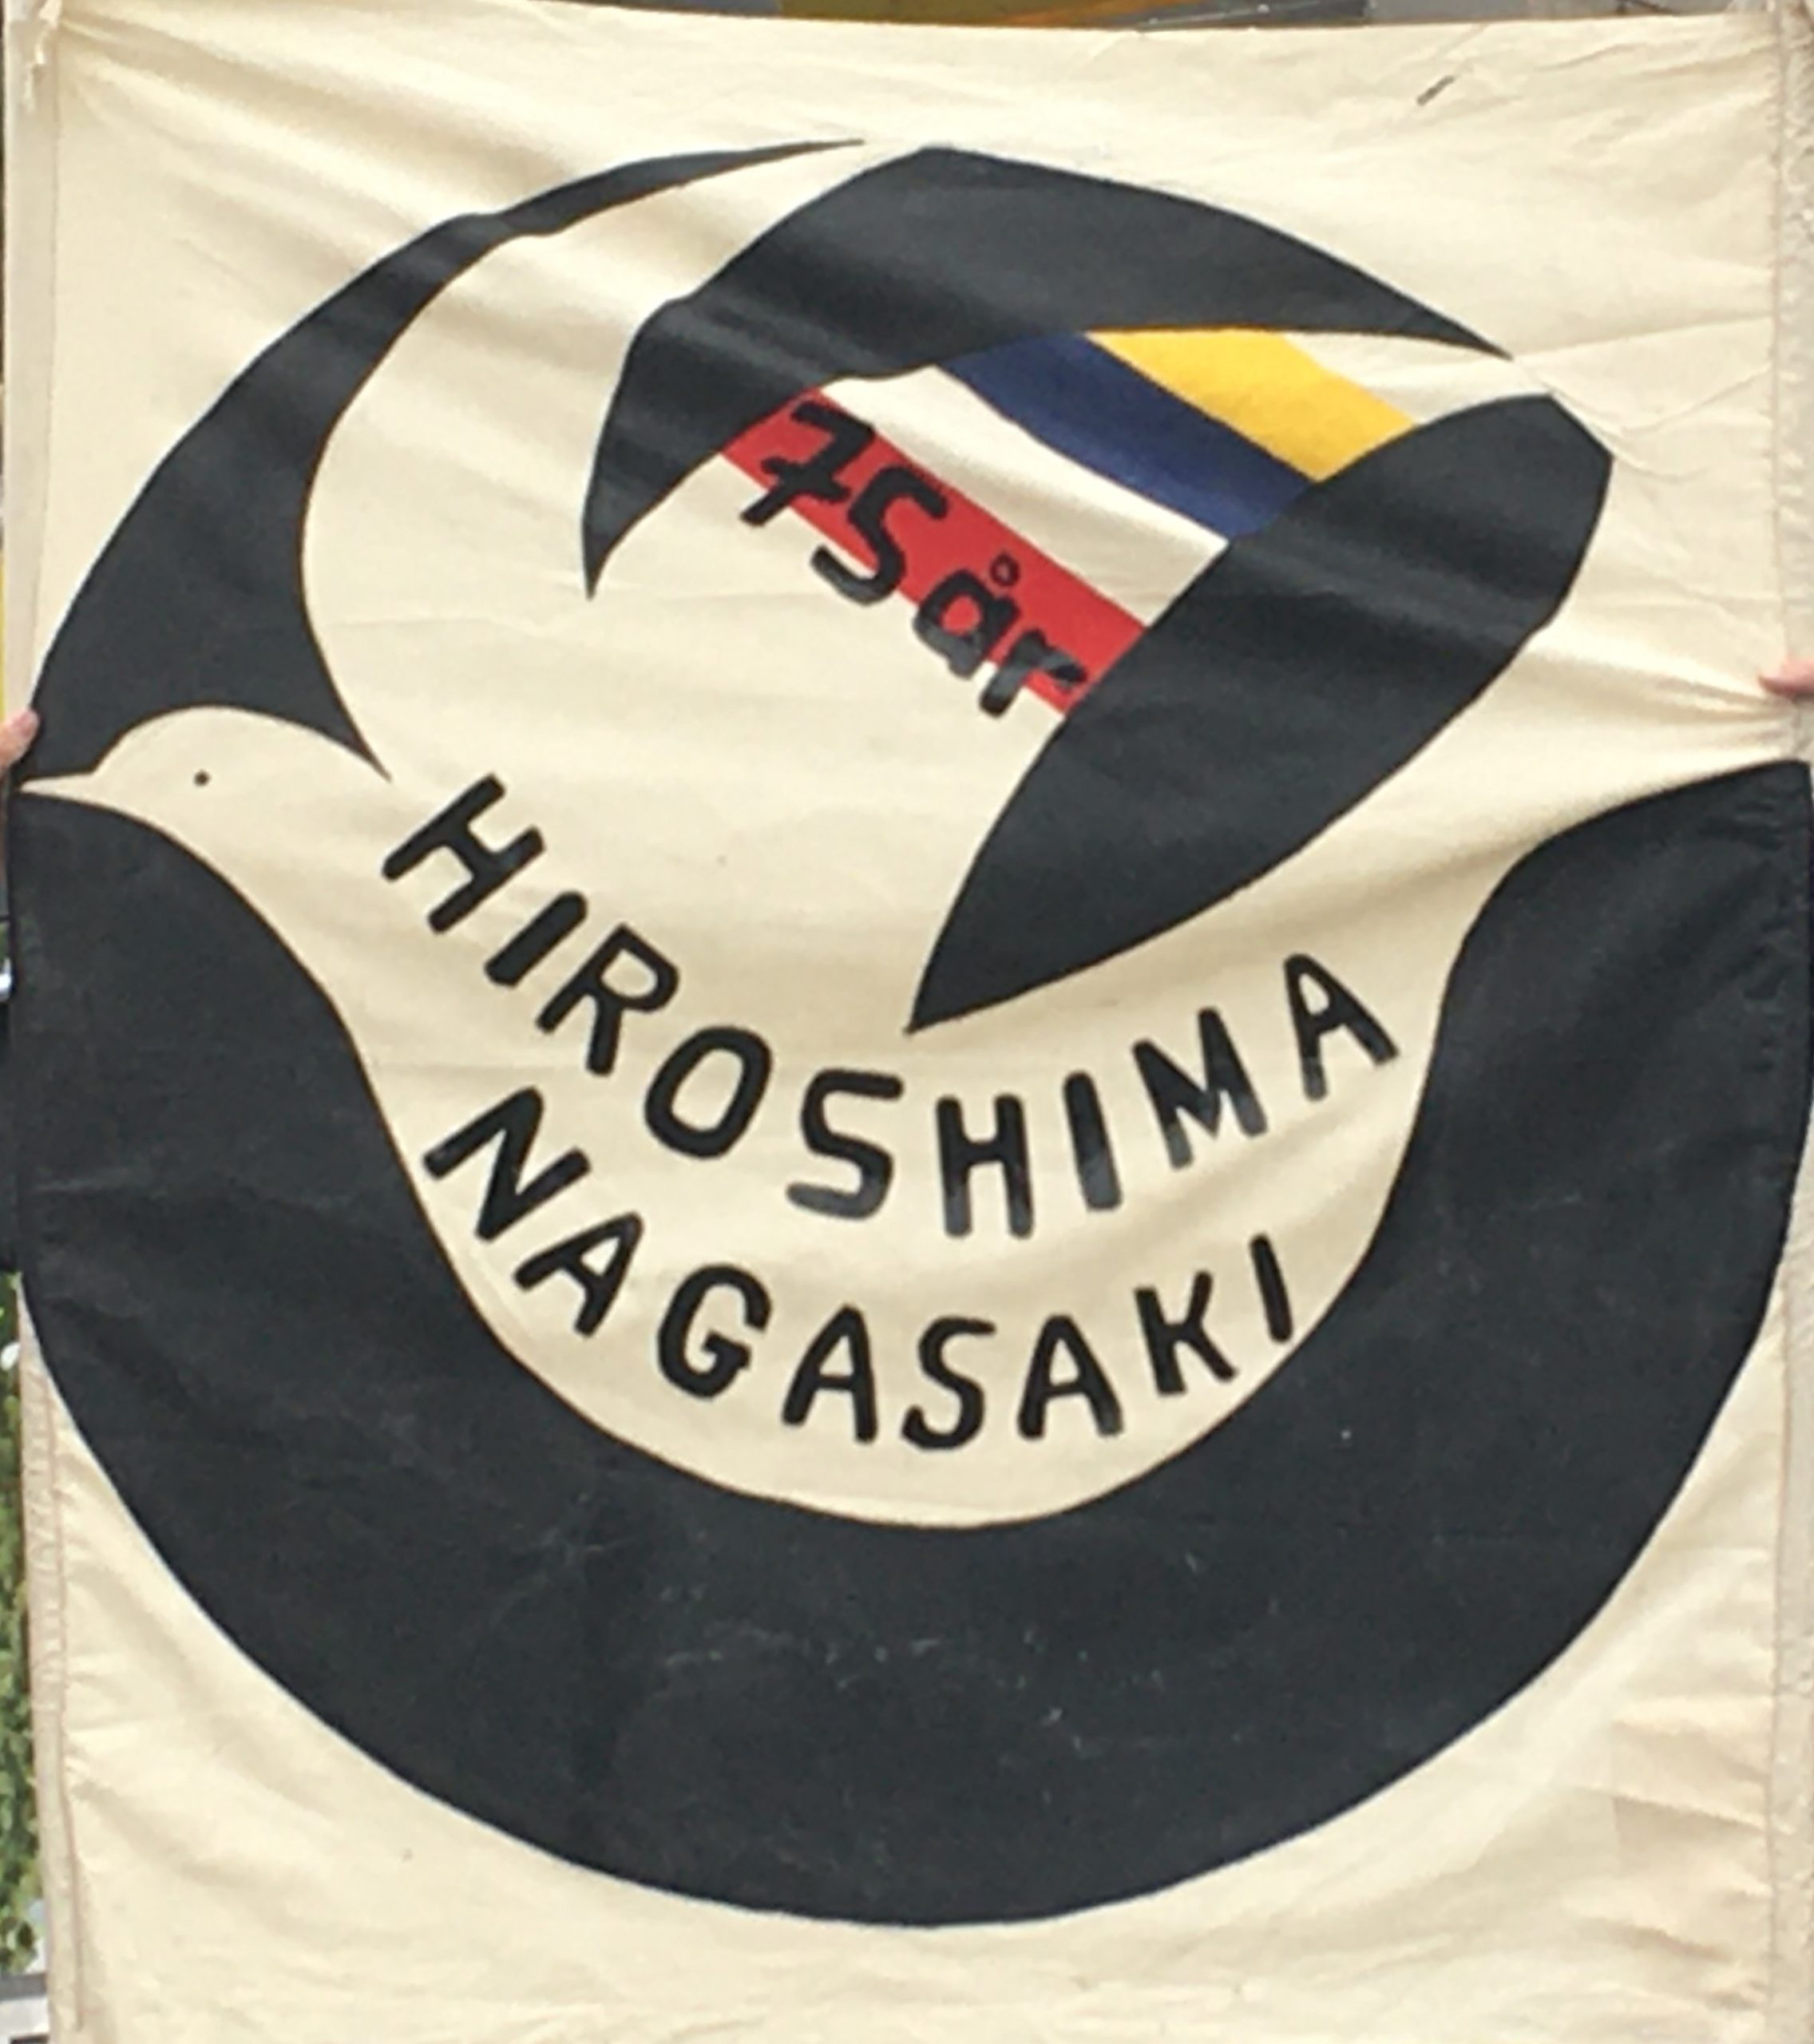 1_75år_Hiroshima_Nagasaki